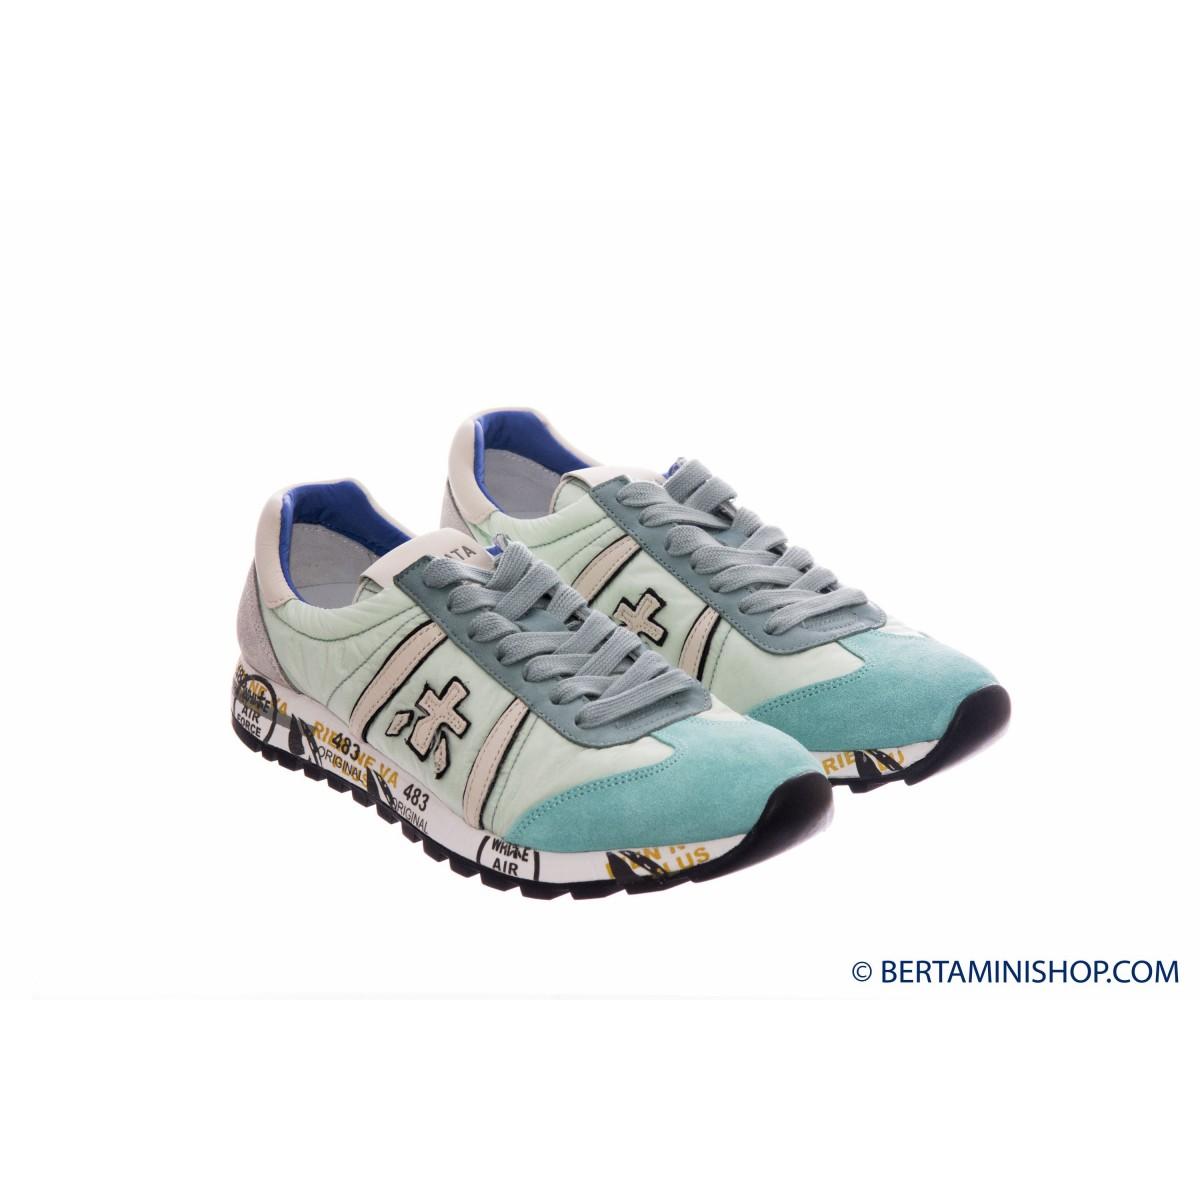 Scarpa Premiata - Lucy-d running